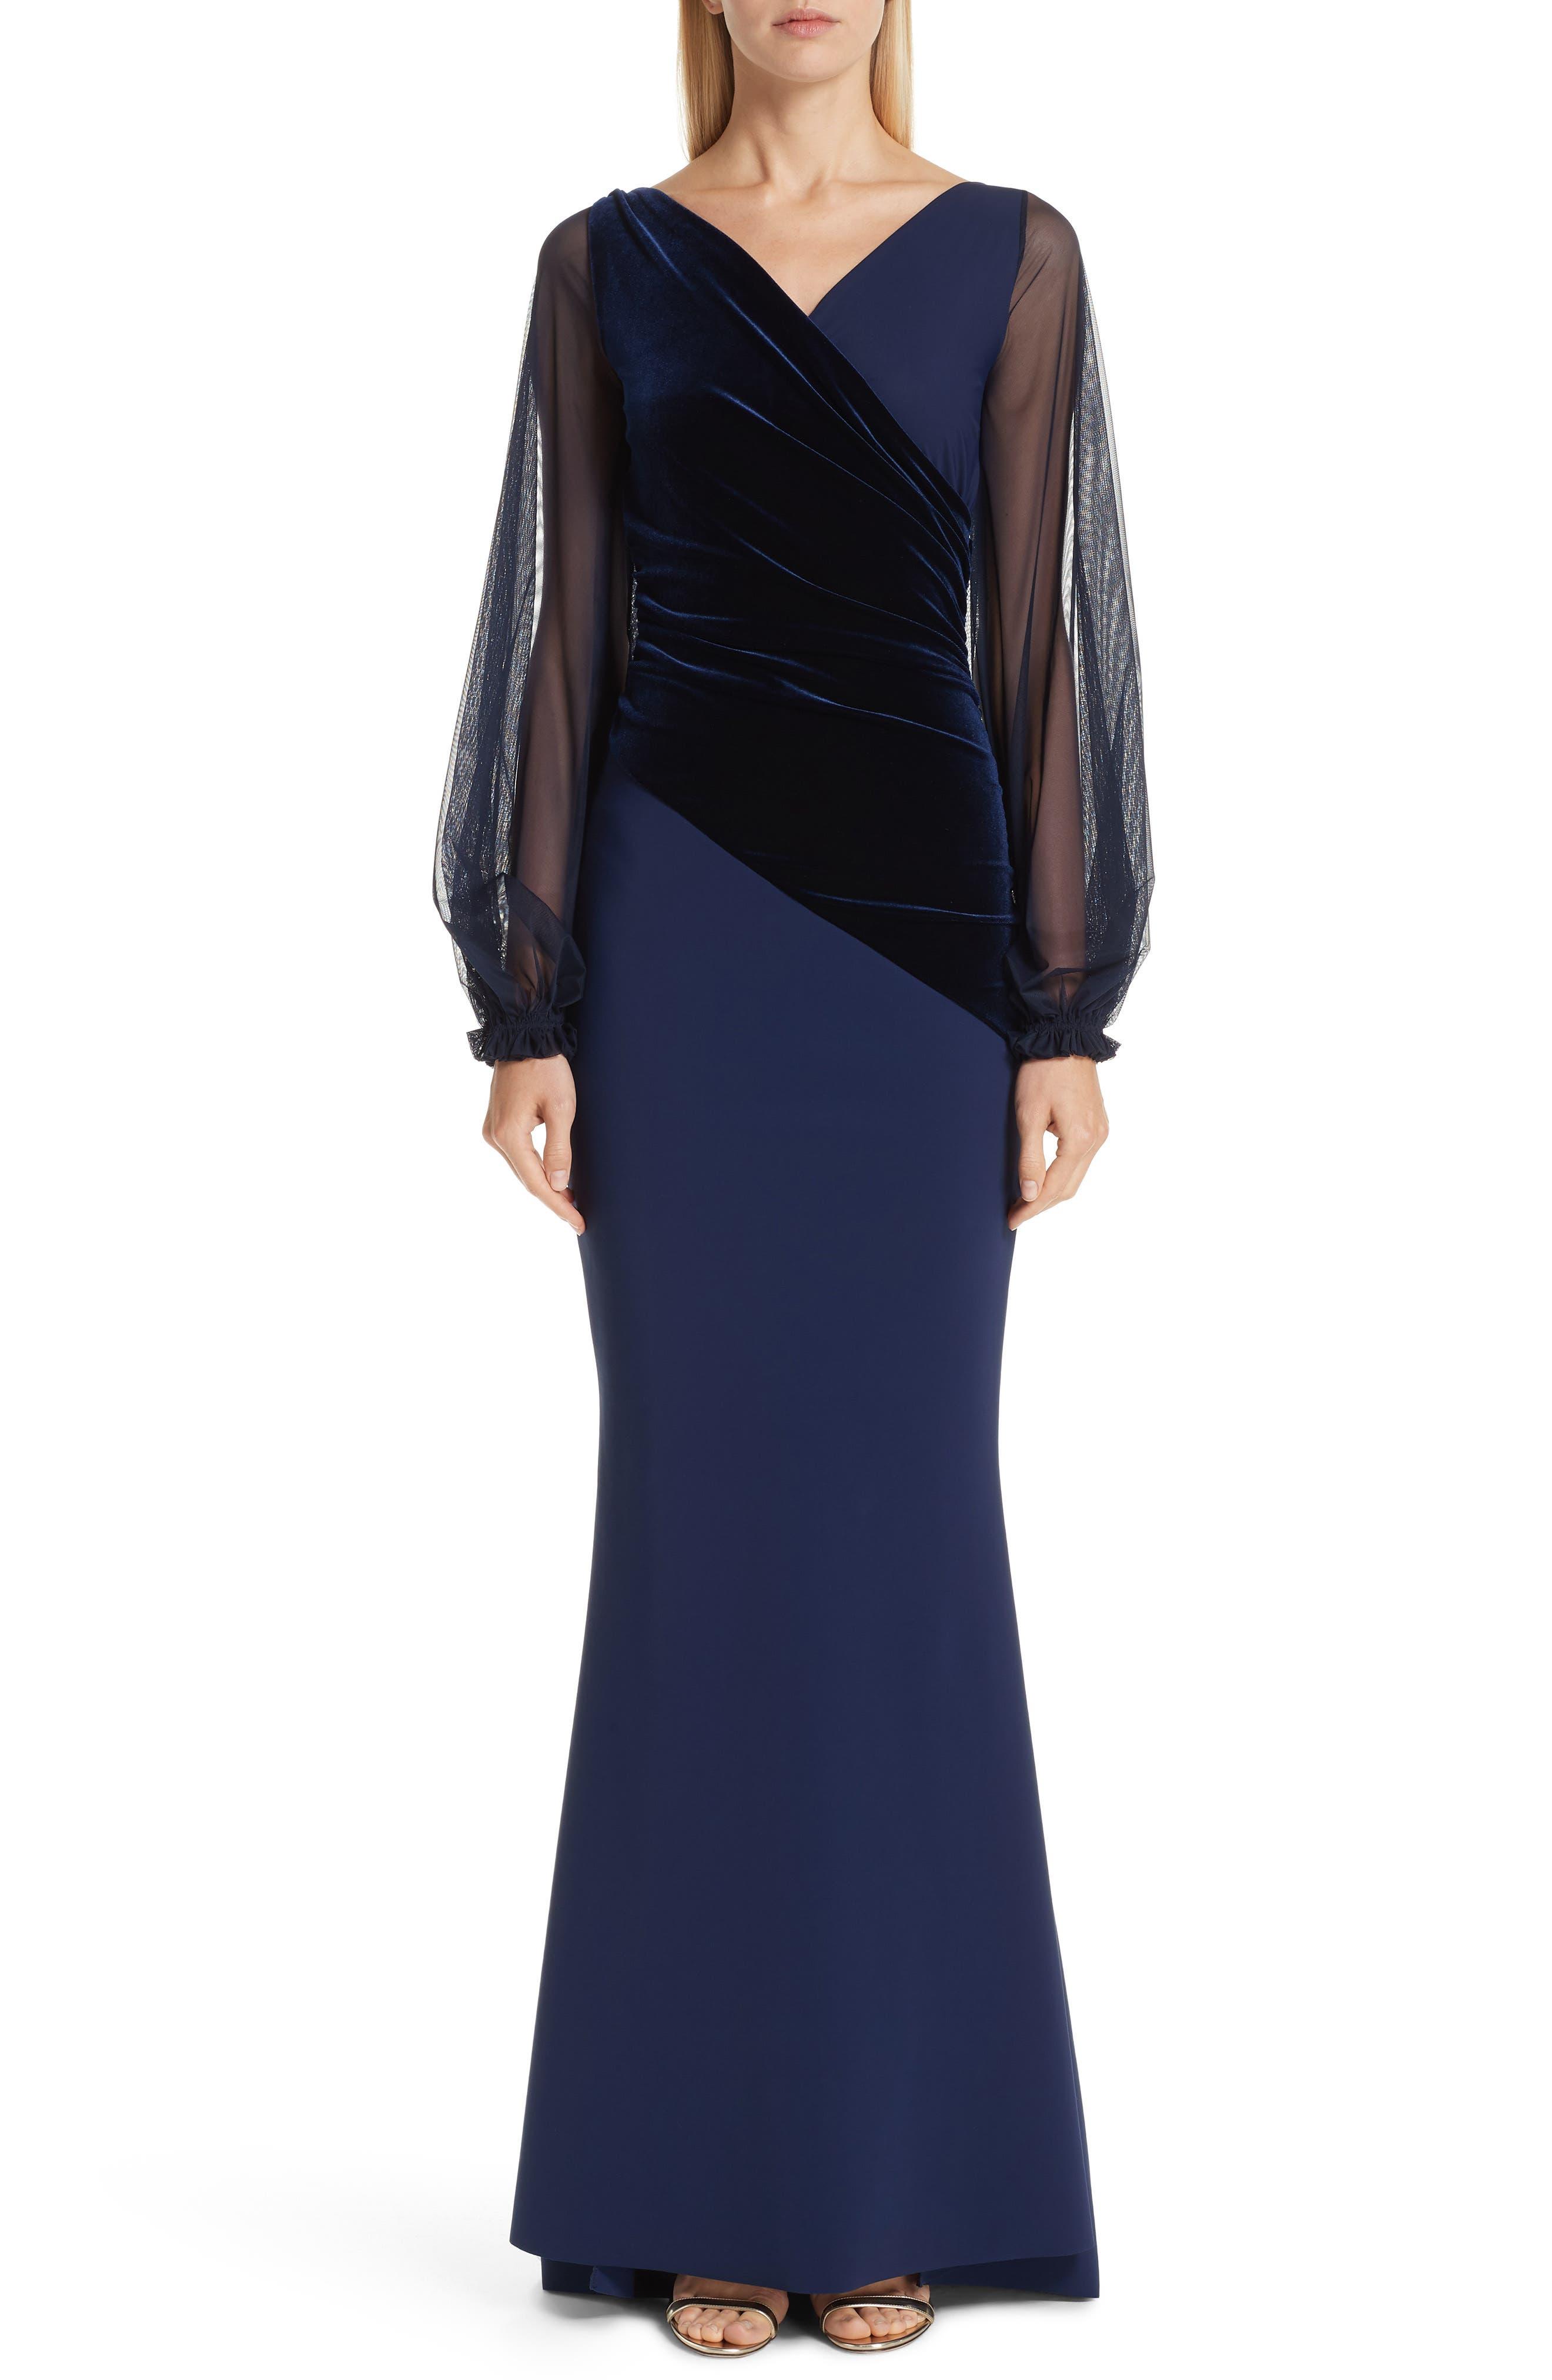 Erenira Mixed Media Gown,                             Main thumbnail 1, color,                             BLUE NOTTE